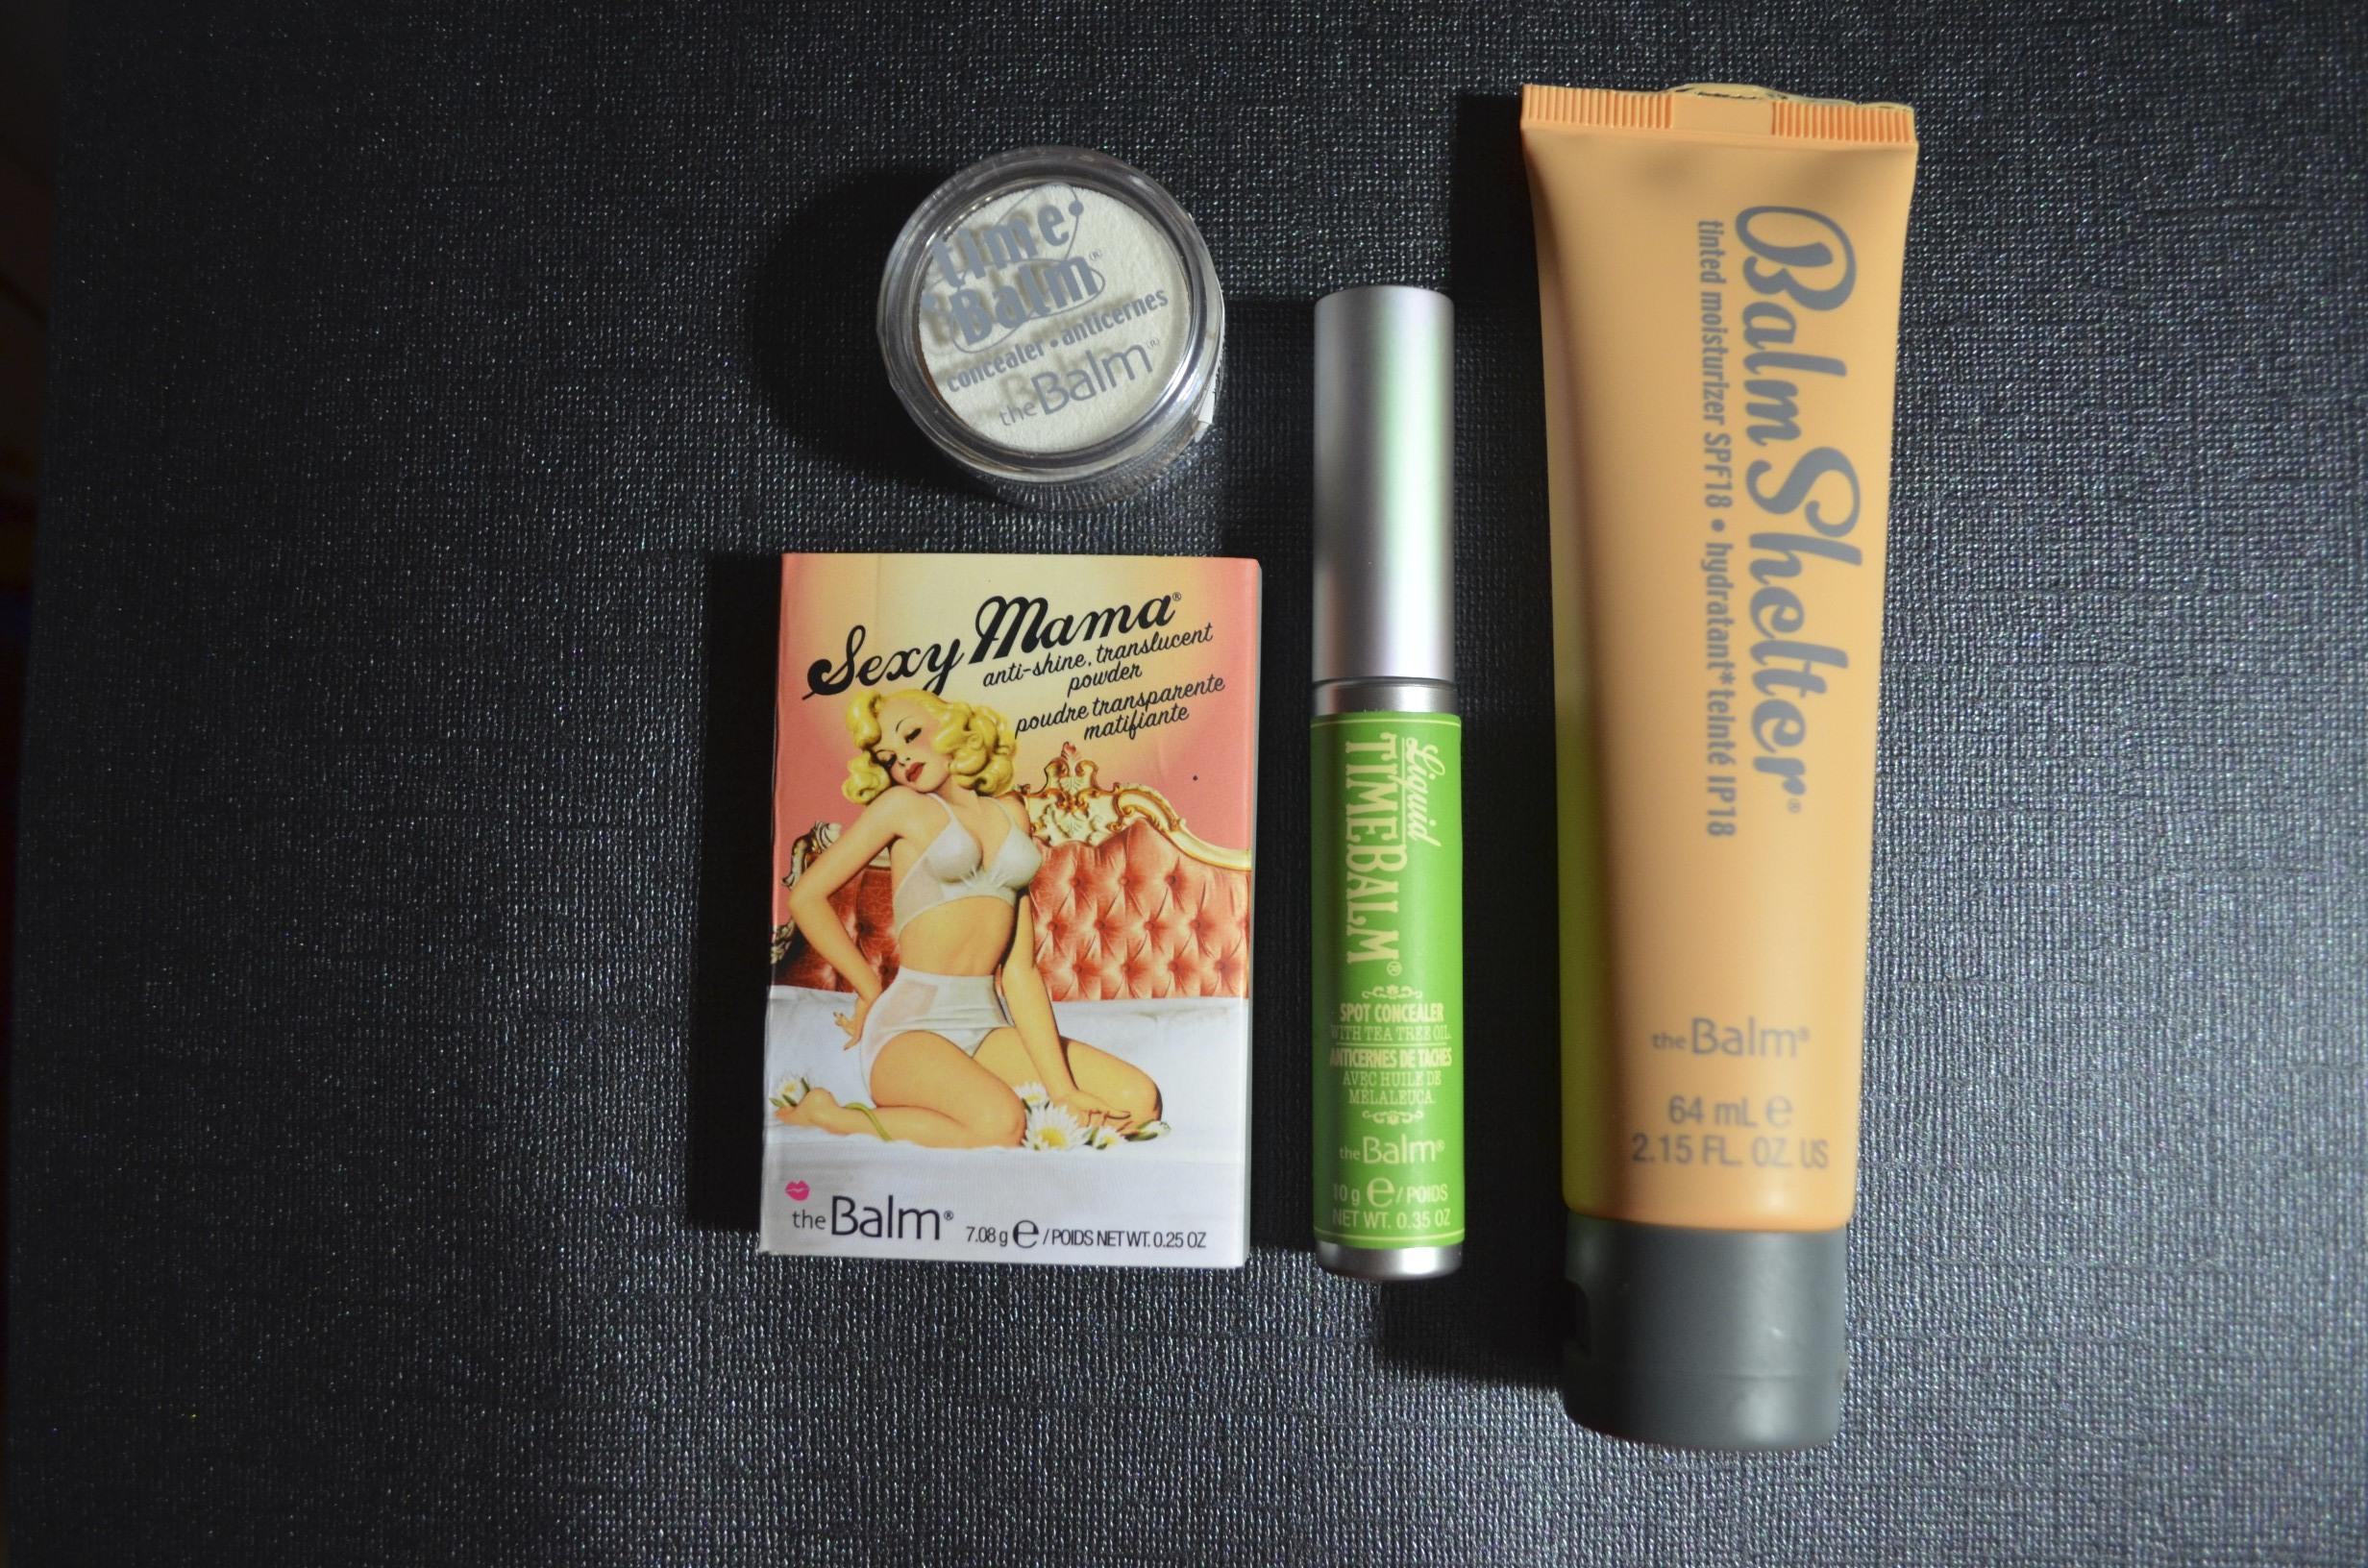 thebalm tinted moisturizer, thebalm timebalm